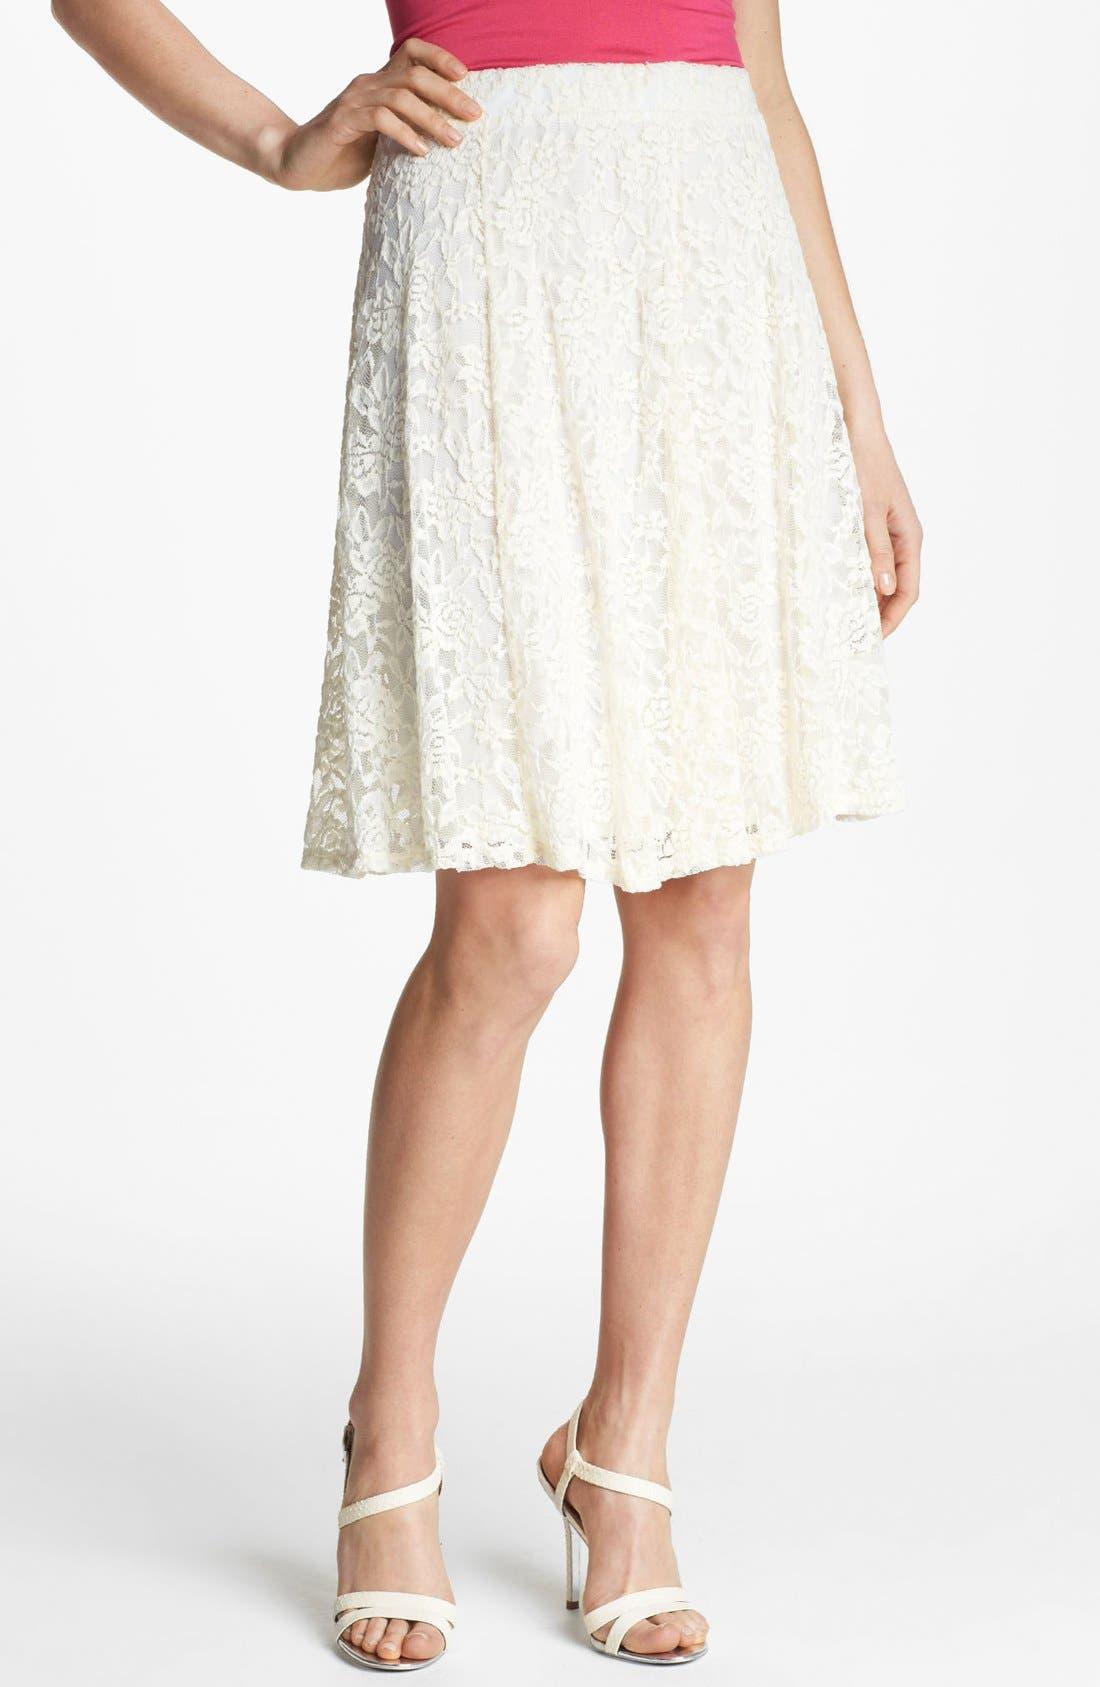 Alternate Image 1 Selected - Bobeau High Waist Lace Skirt